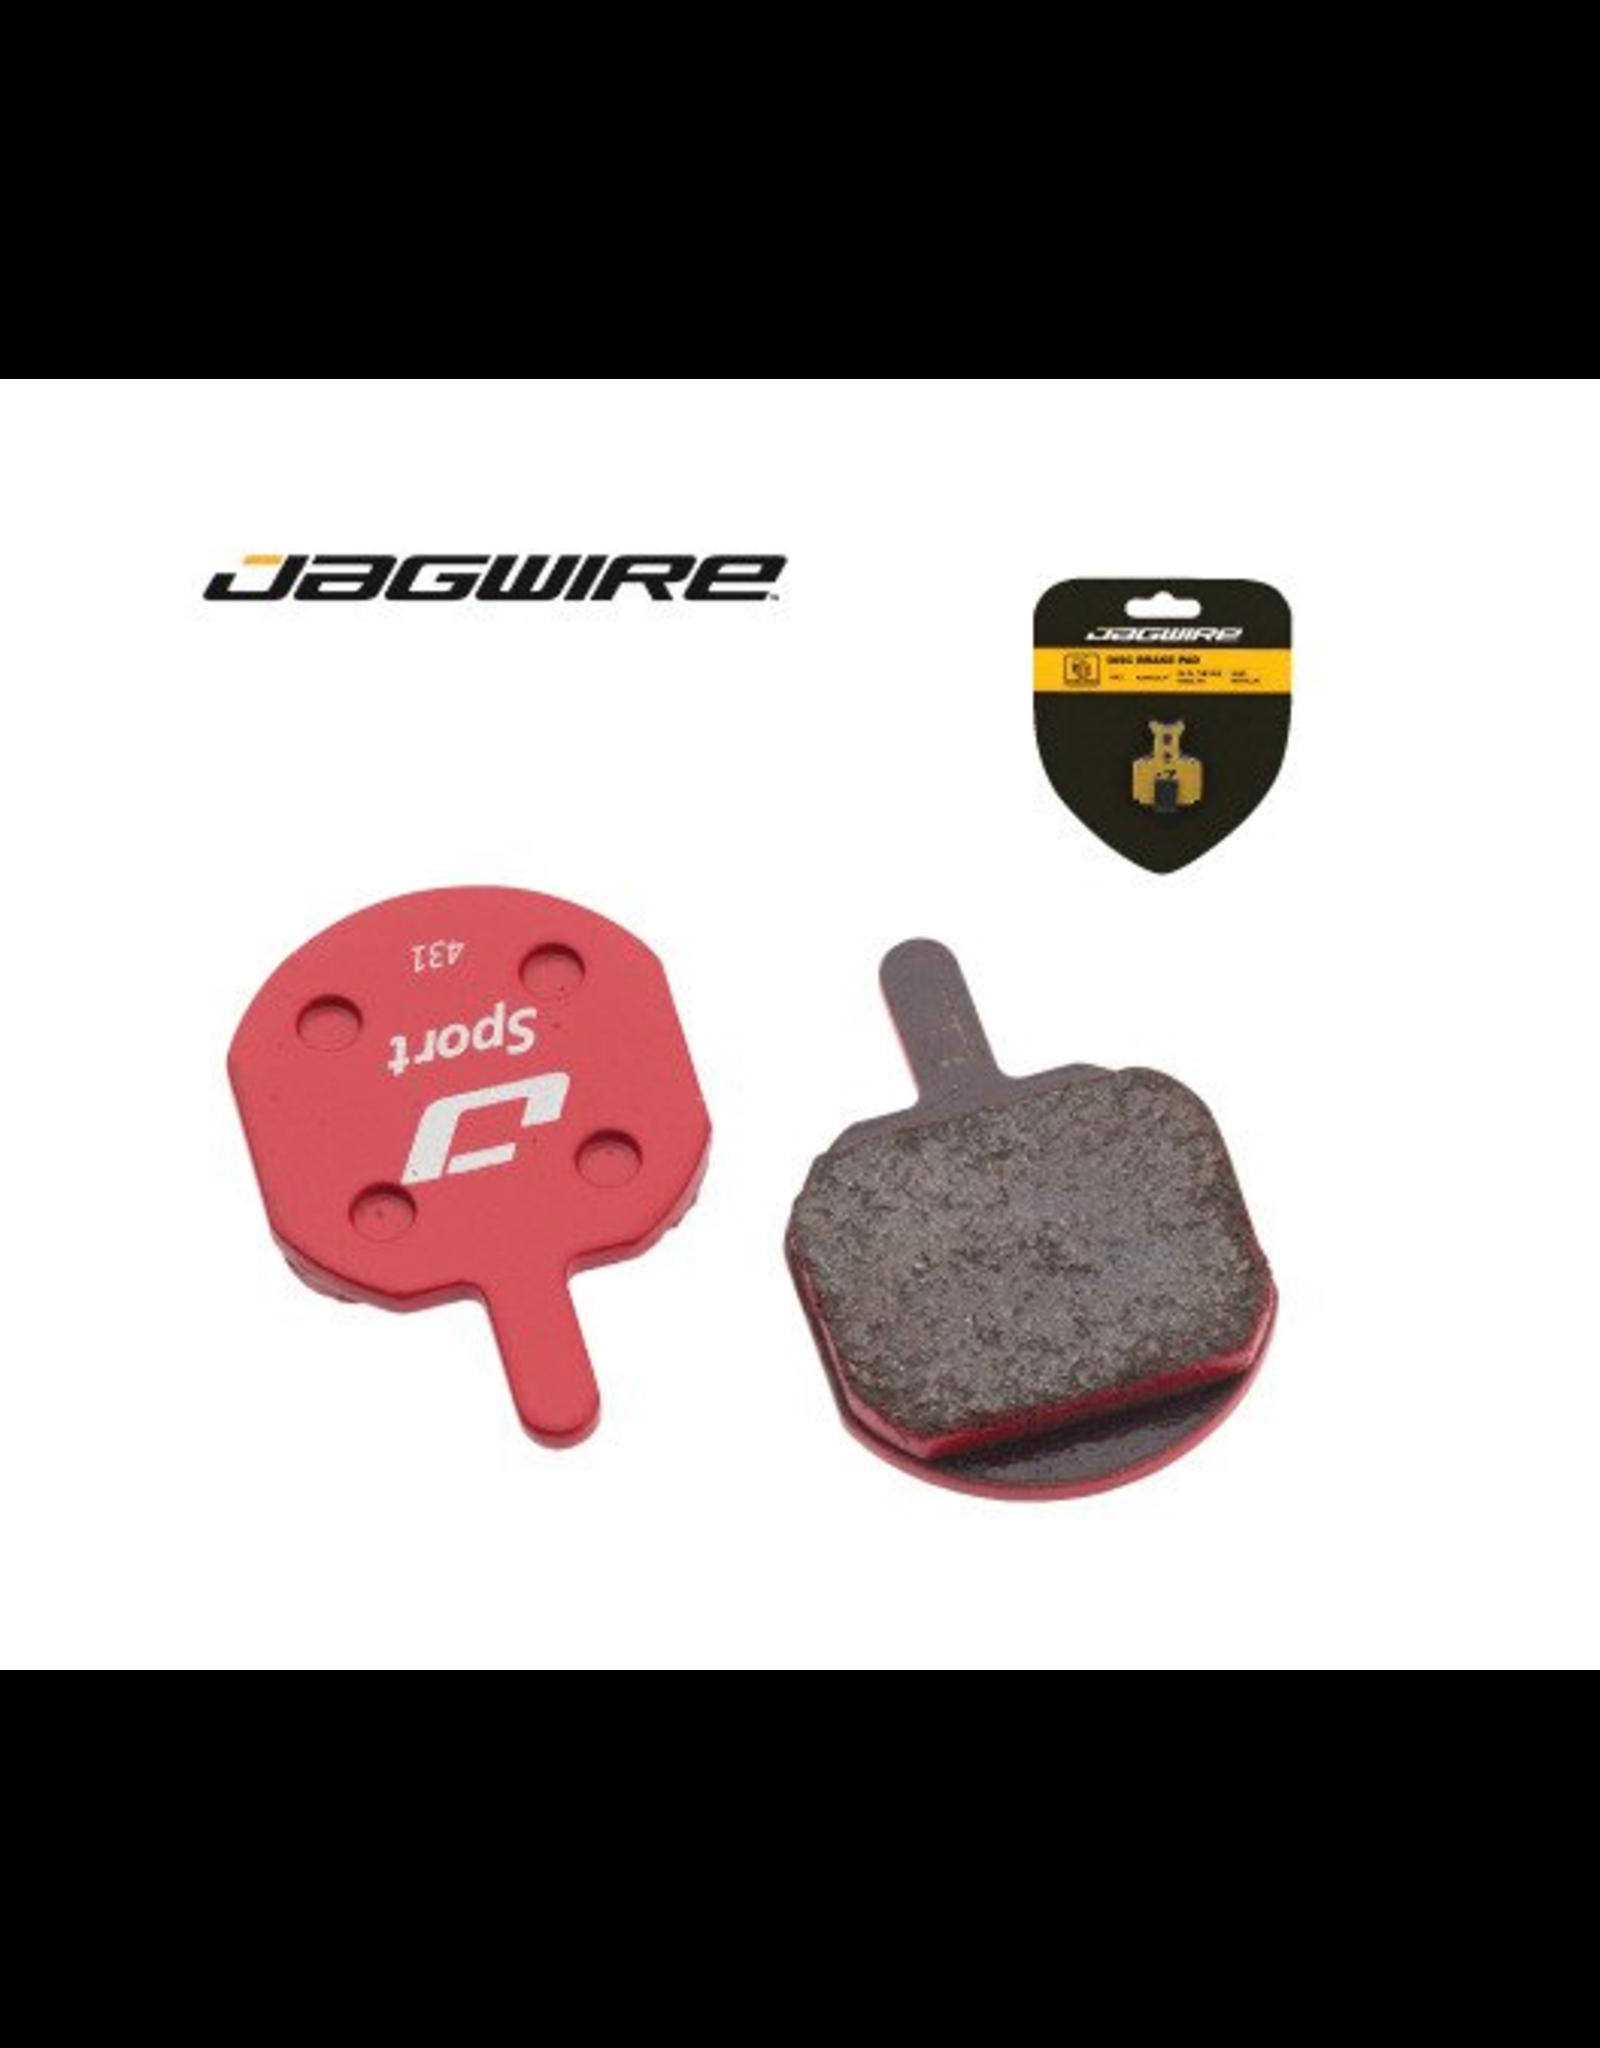 Jagwire Jagwire, Mountain Sport, Disc brake pads, Semi-metallic, Hayes CX5, MX5, MX4, MX3, MX2, Sole